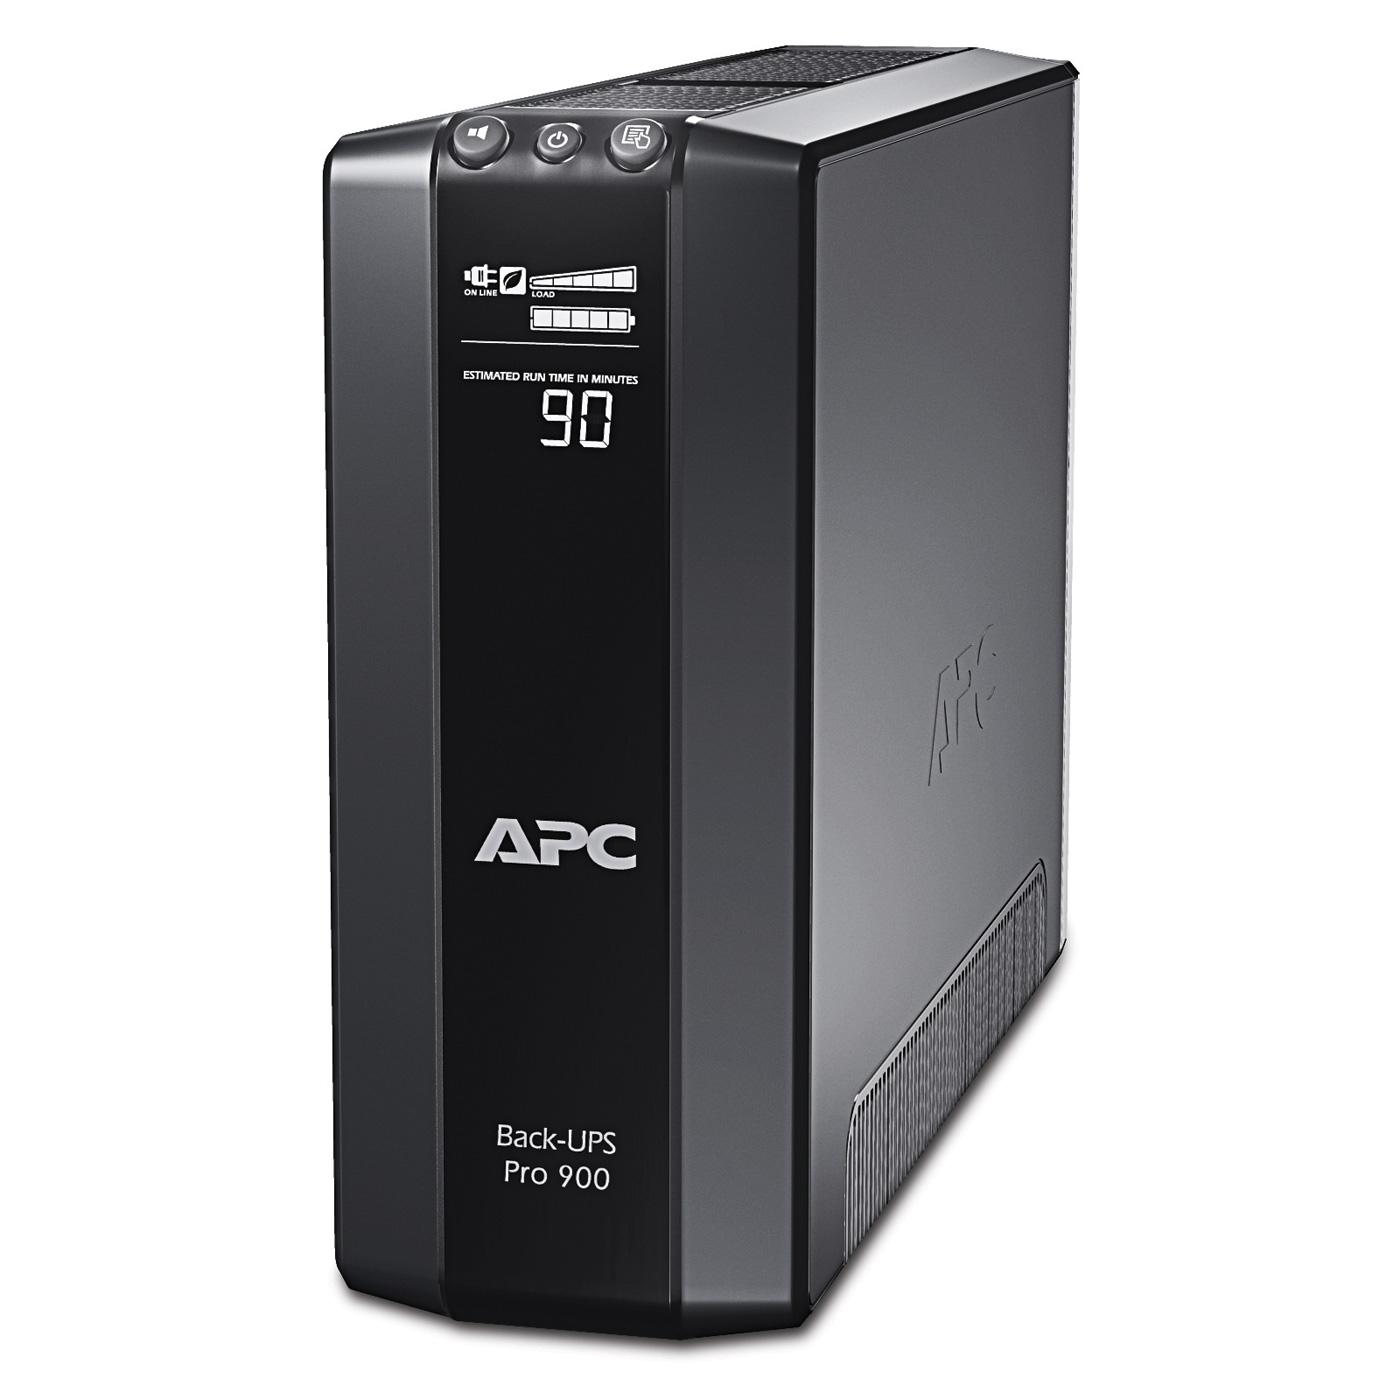 Onduleur APC Back-UPS Pro 900G APC Back-UPS Pro 900G - Onduleur line-interactive 900 VA (USB / Série) - Prises FR